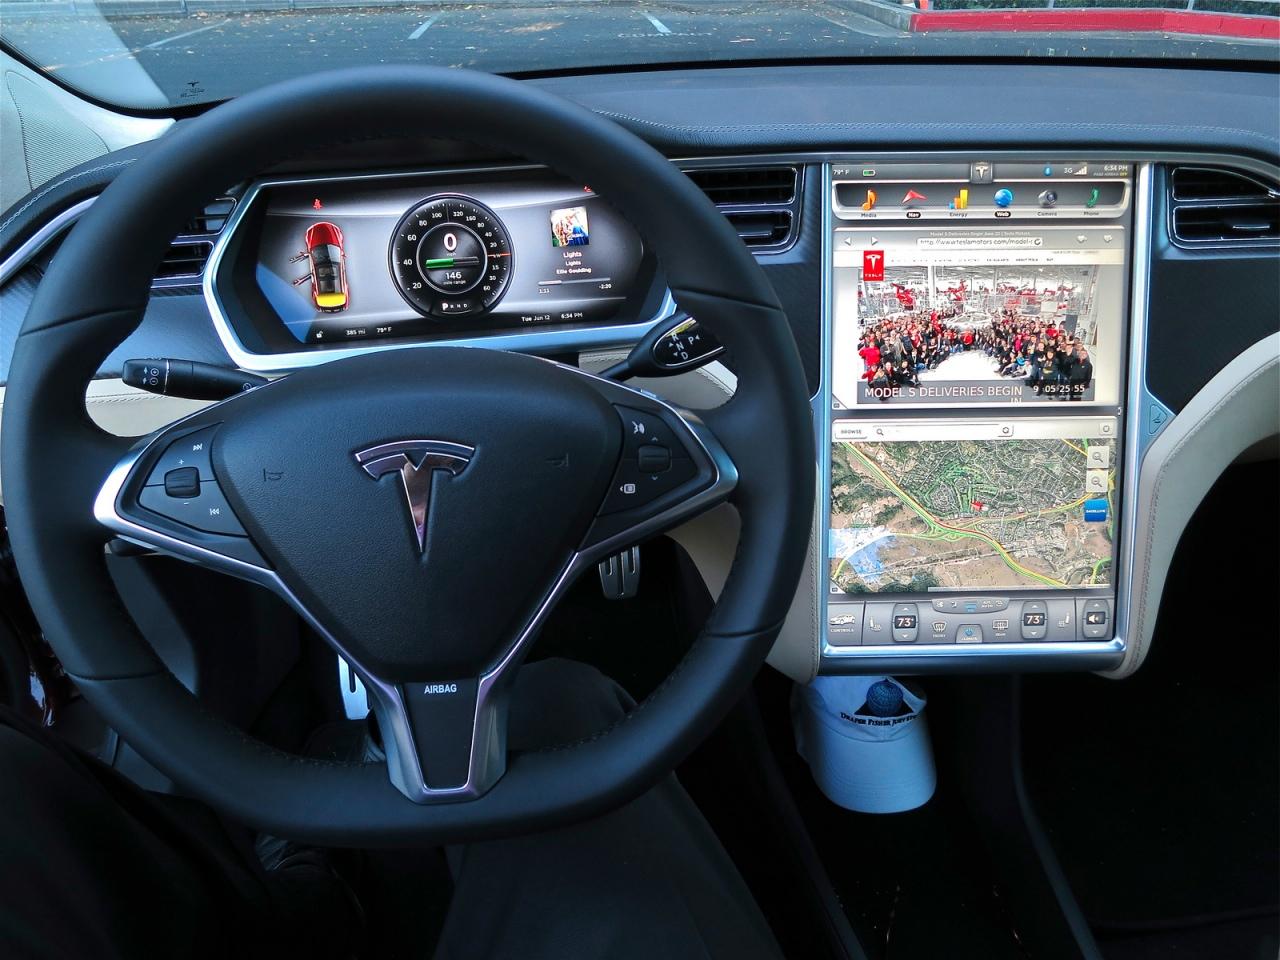 Tesla Automatic Car Display 42 Hd Wallpaper